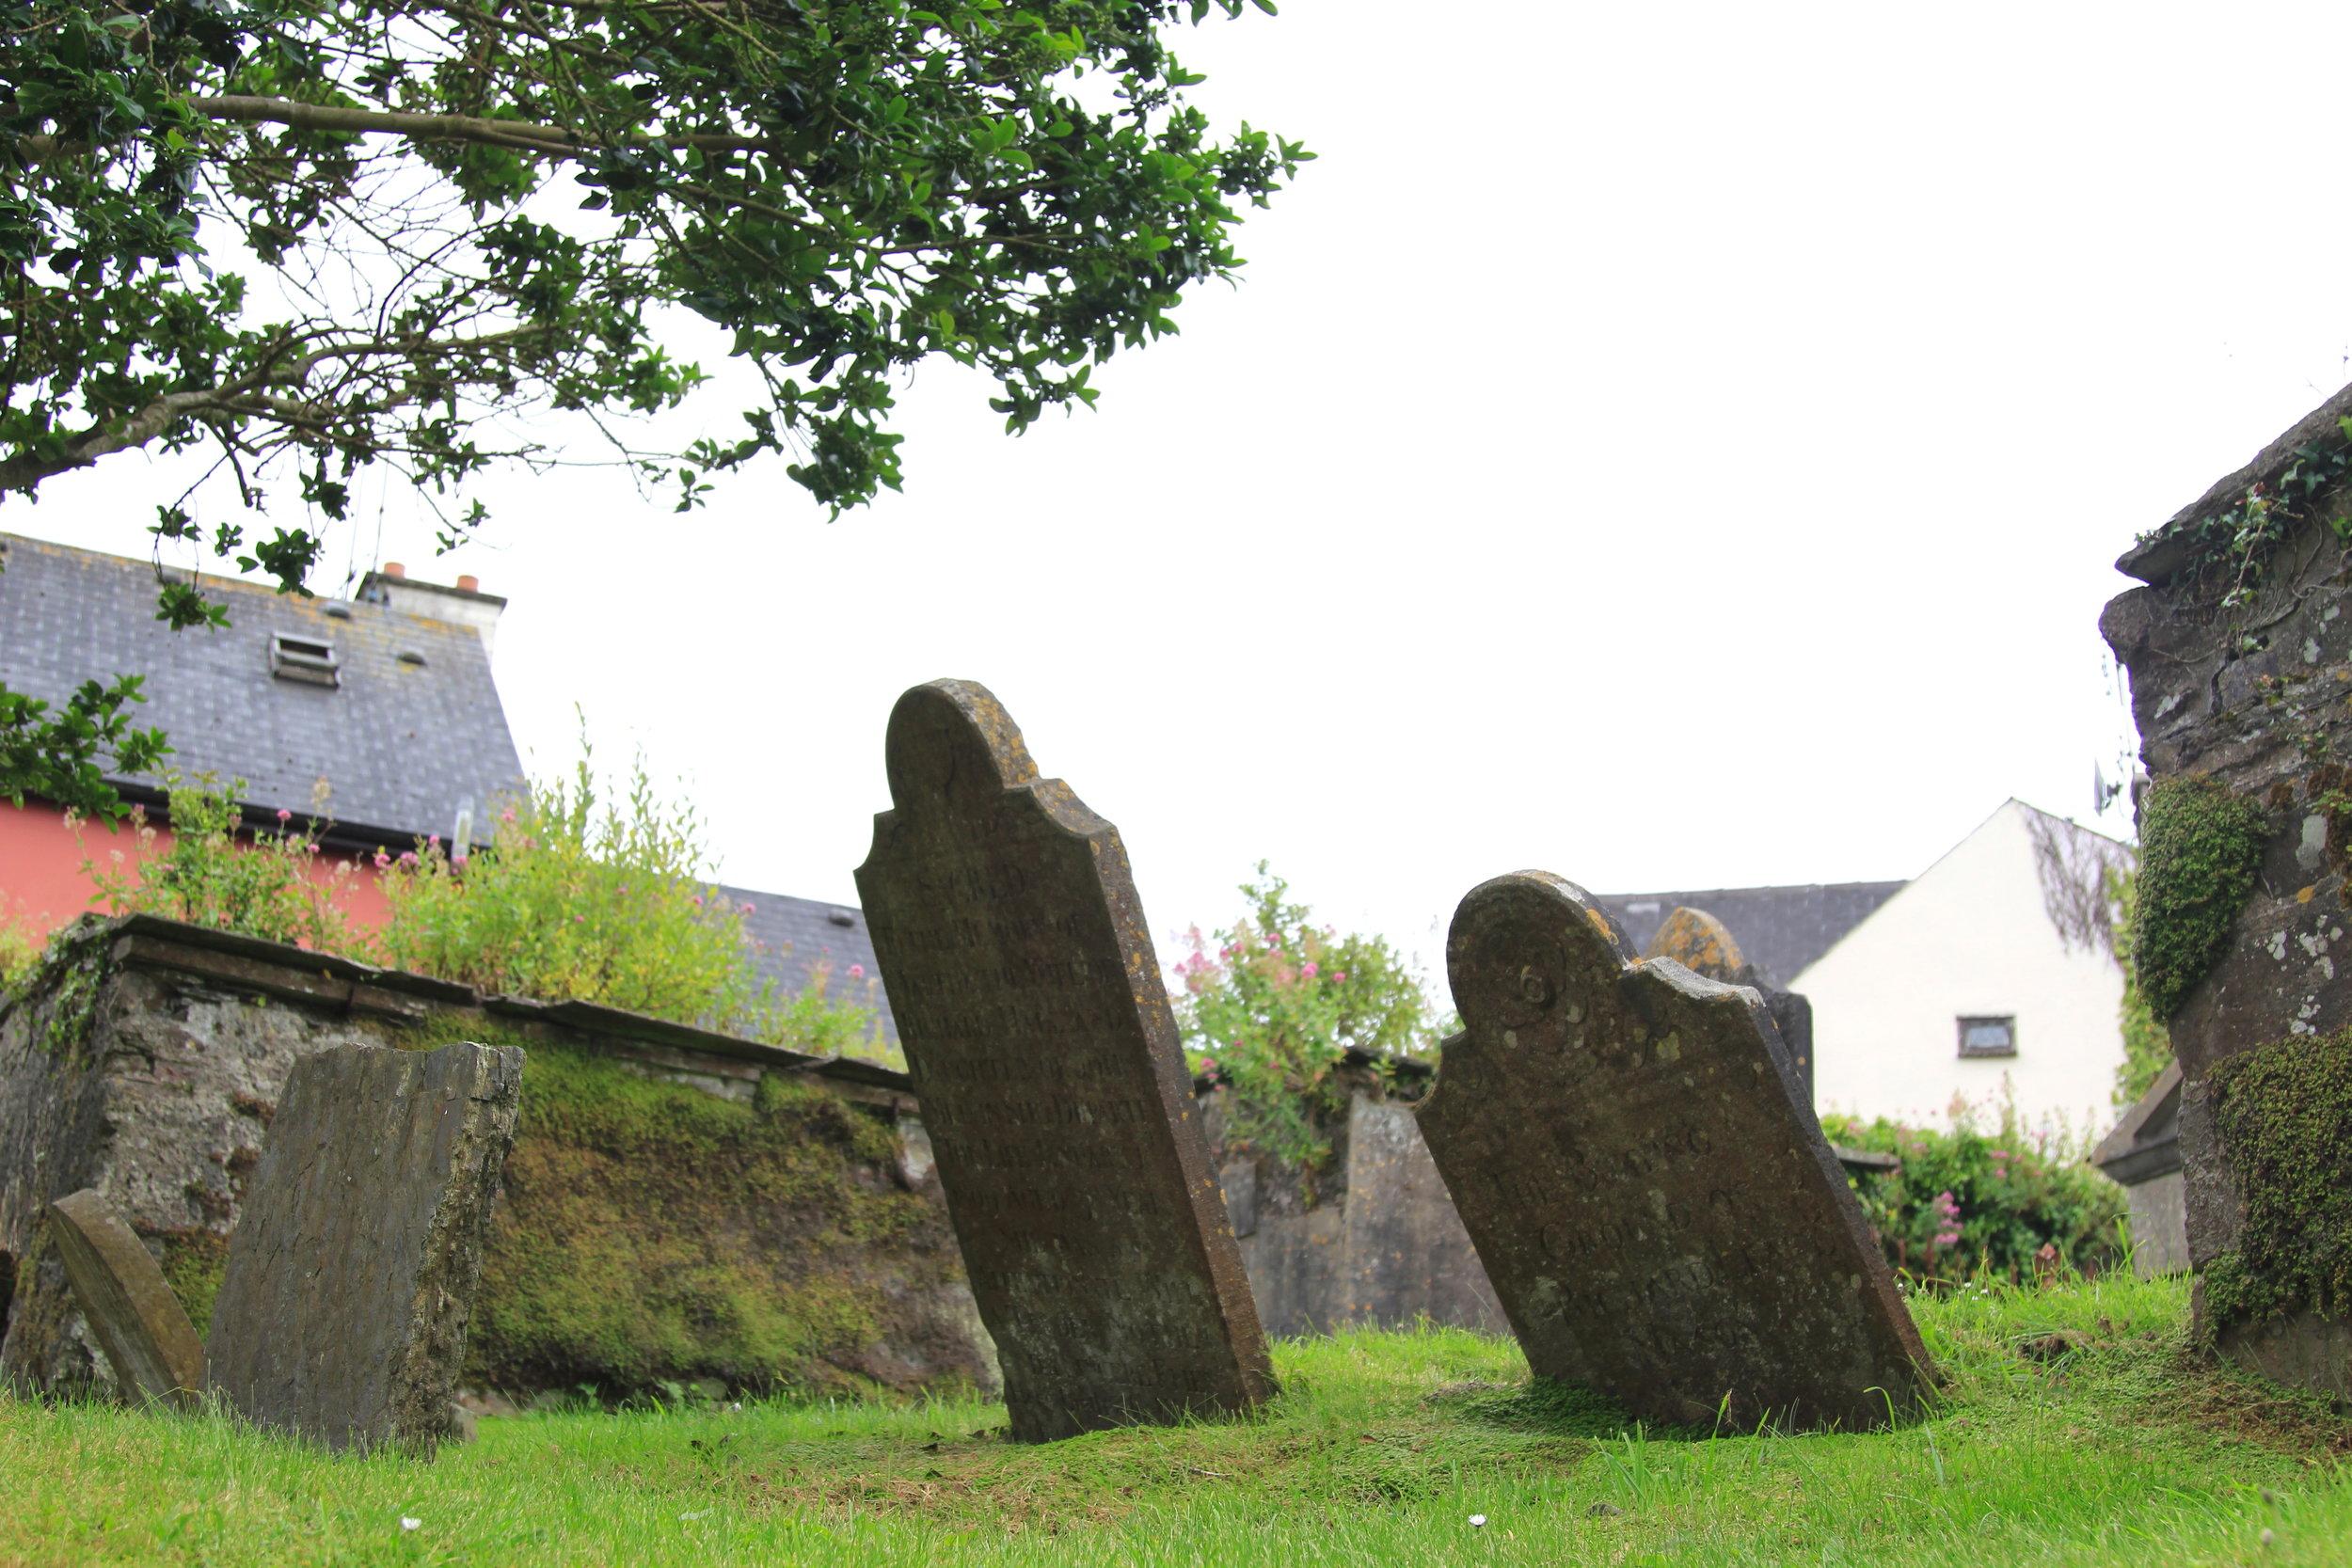 Old gravestones at St. Multose Church, Ireland